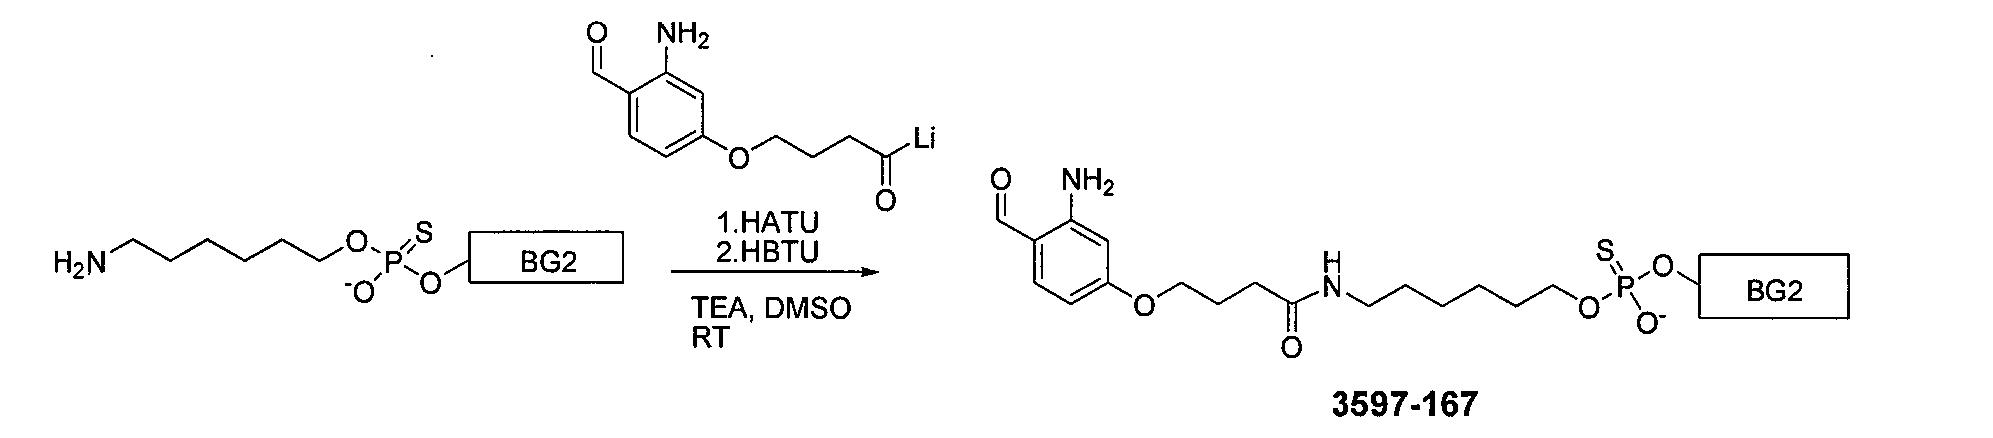 CN102264697A - Pyrroline produced biosynthetically - carboxy ... on